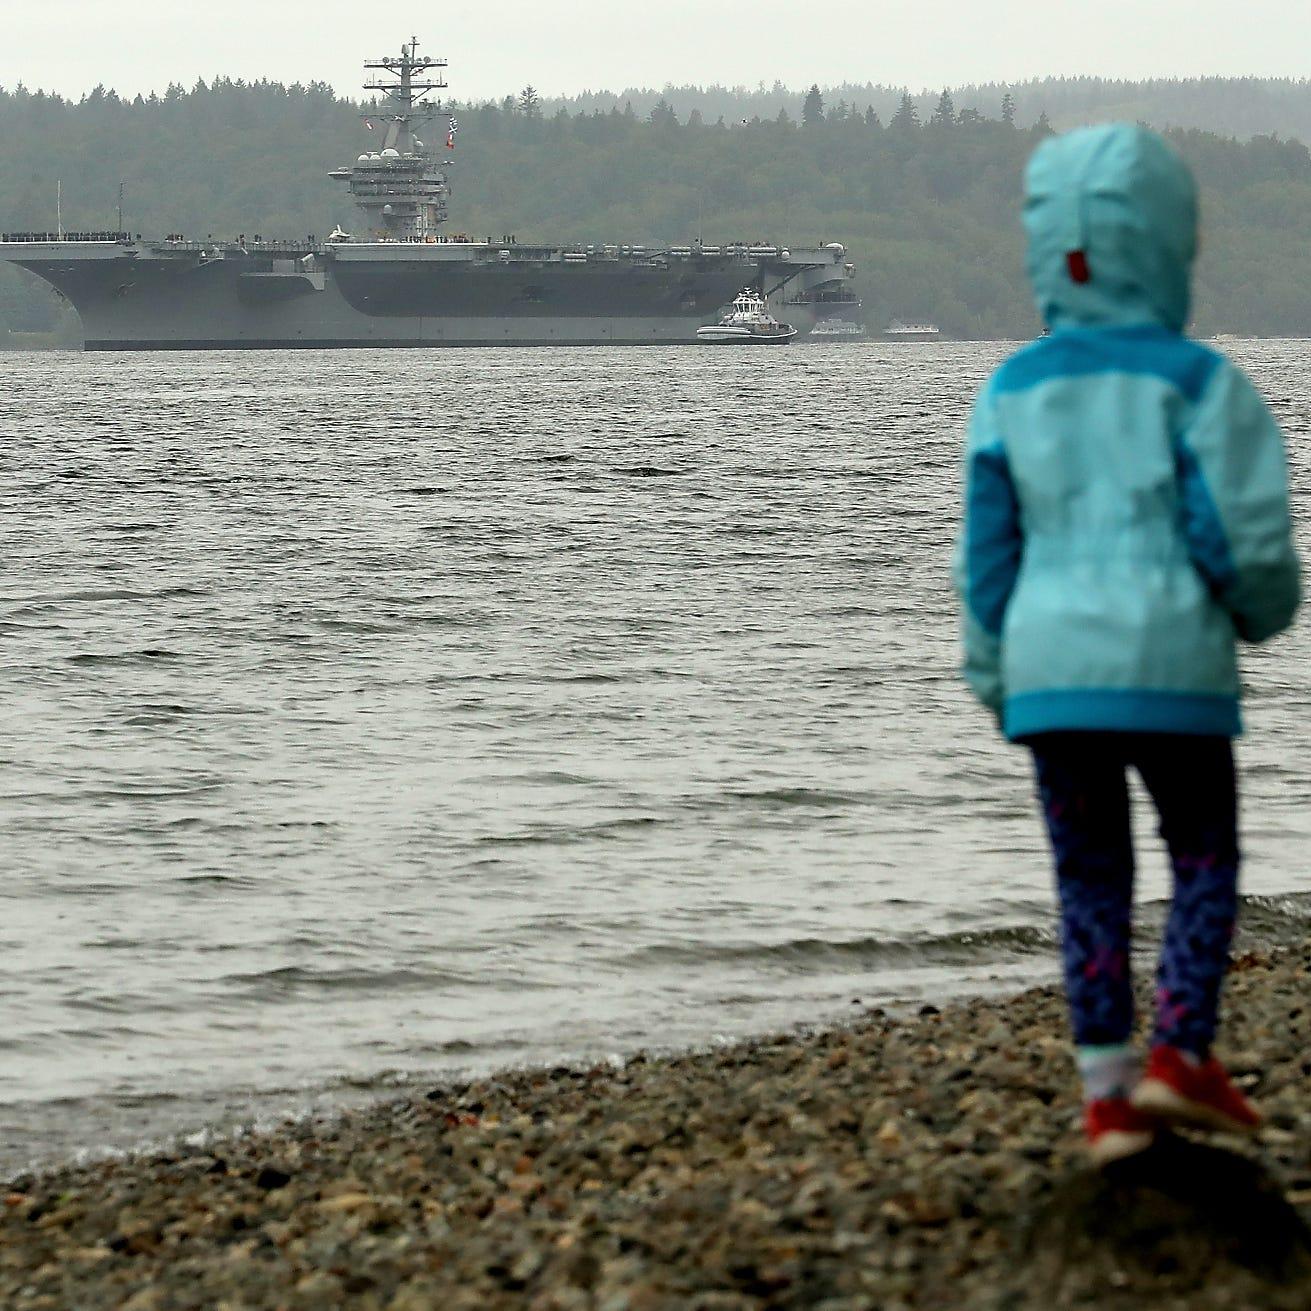 Nimitz, the nation's oldest carrier, leaves Bremerton for training